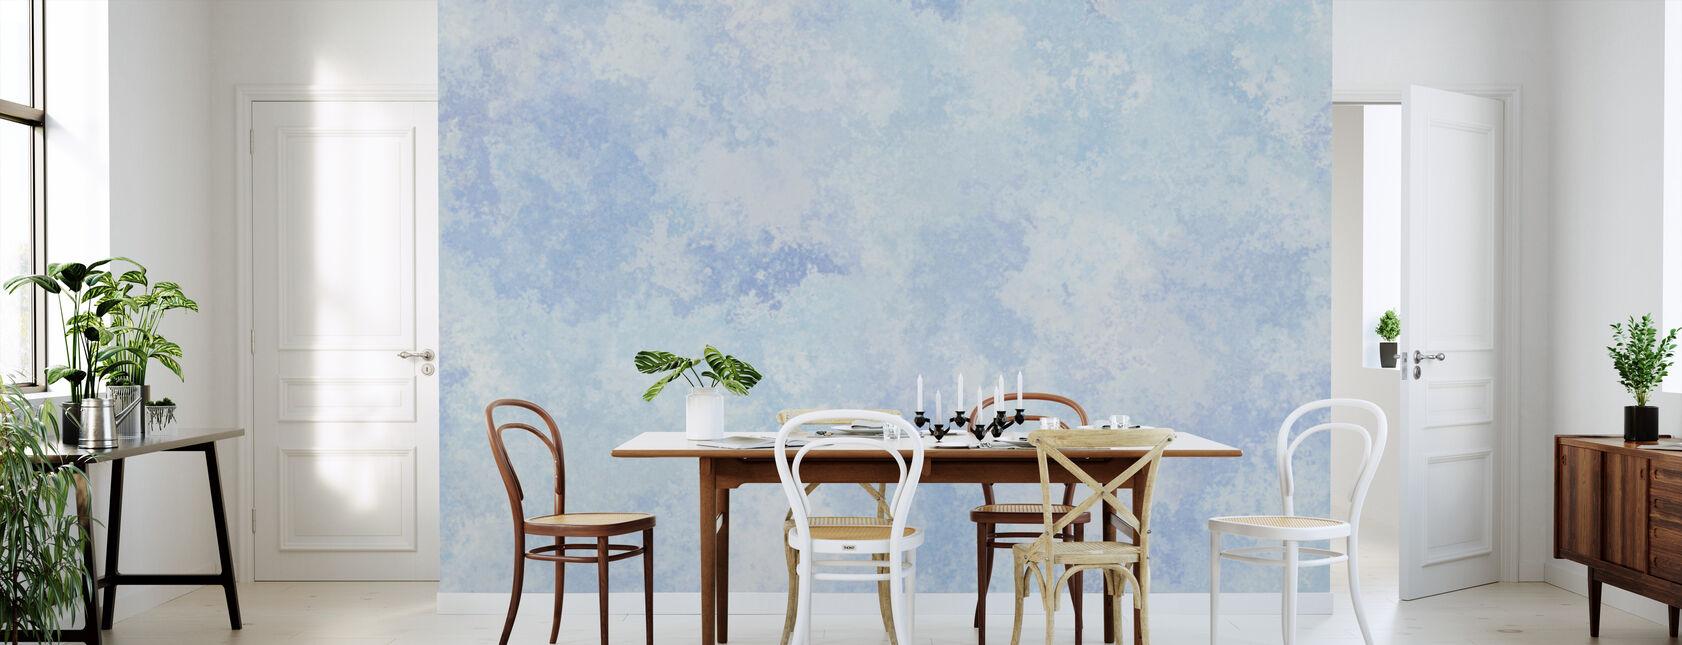 Flying High Sky 2 - Wallpaper - Kitchen